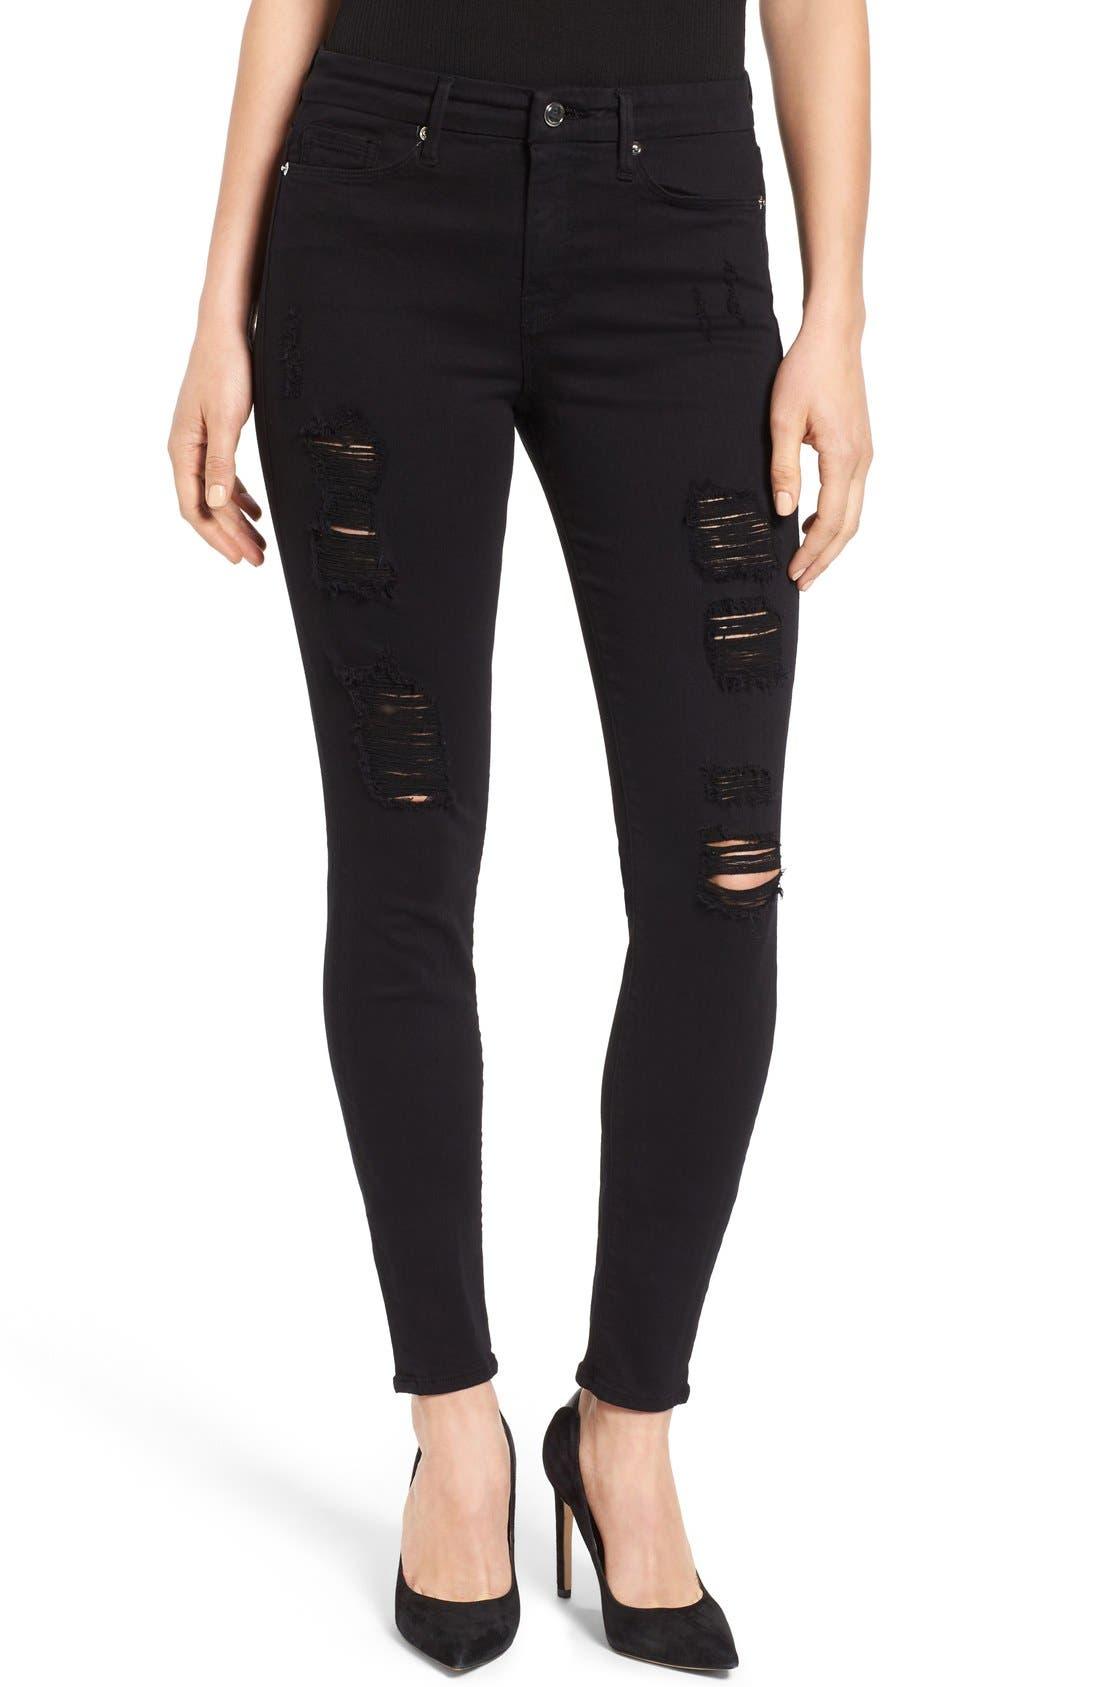 Alternate Image 1 Selected - Good American Good Legs High Rise Ripped Skinny Jeans (Black 002)